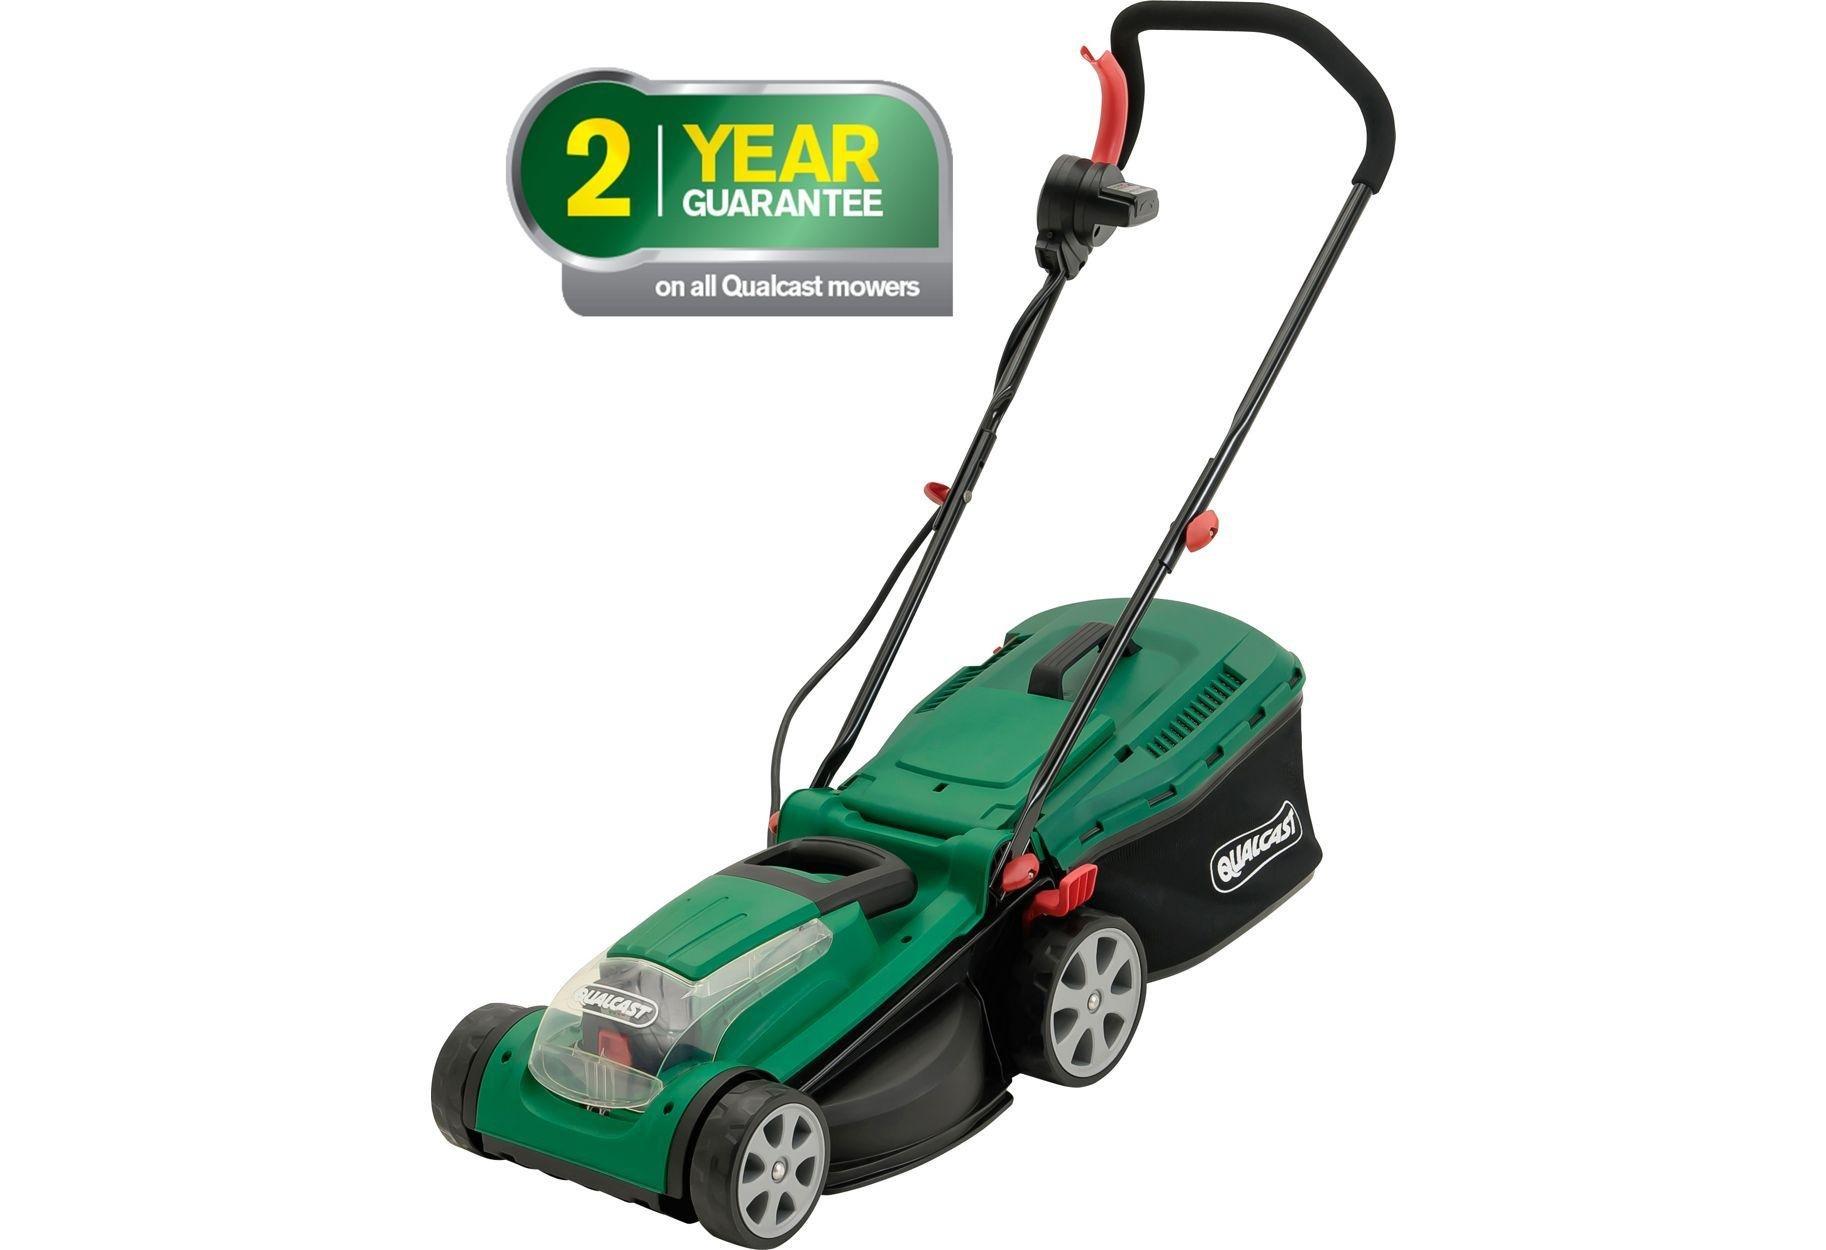 qualcast-cordless-lawnmower-36v